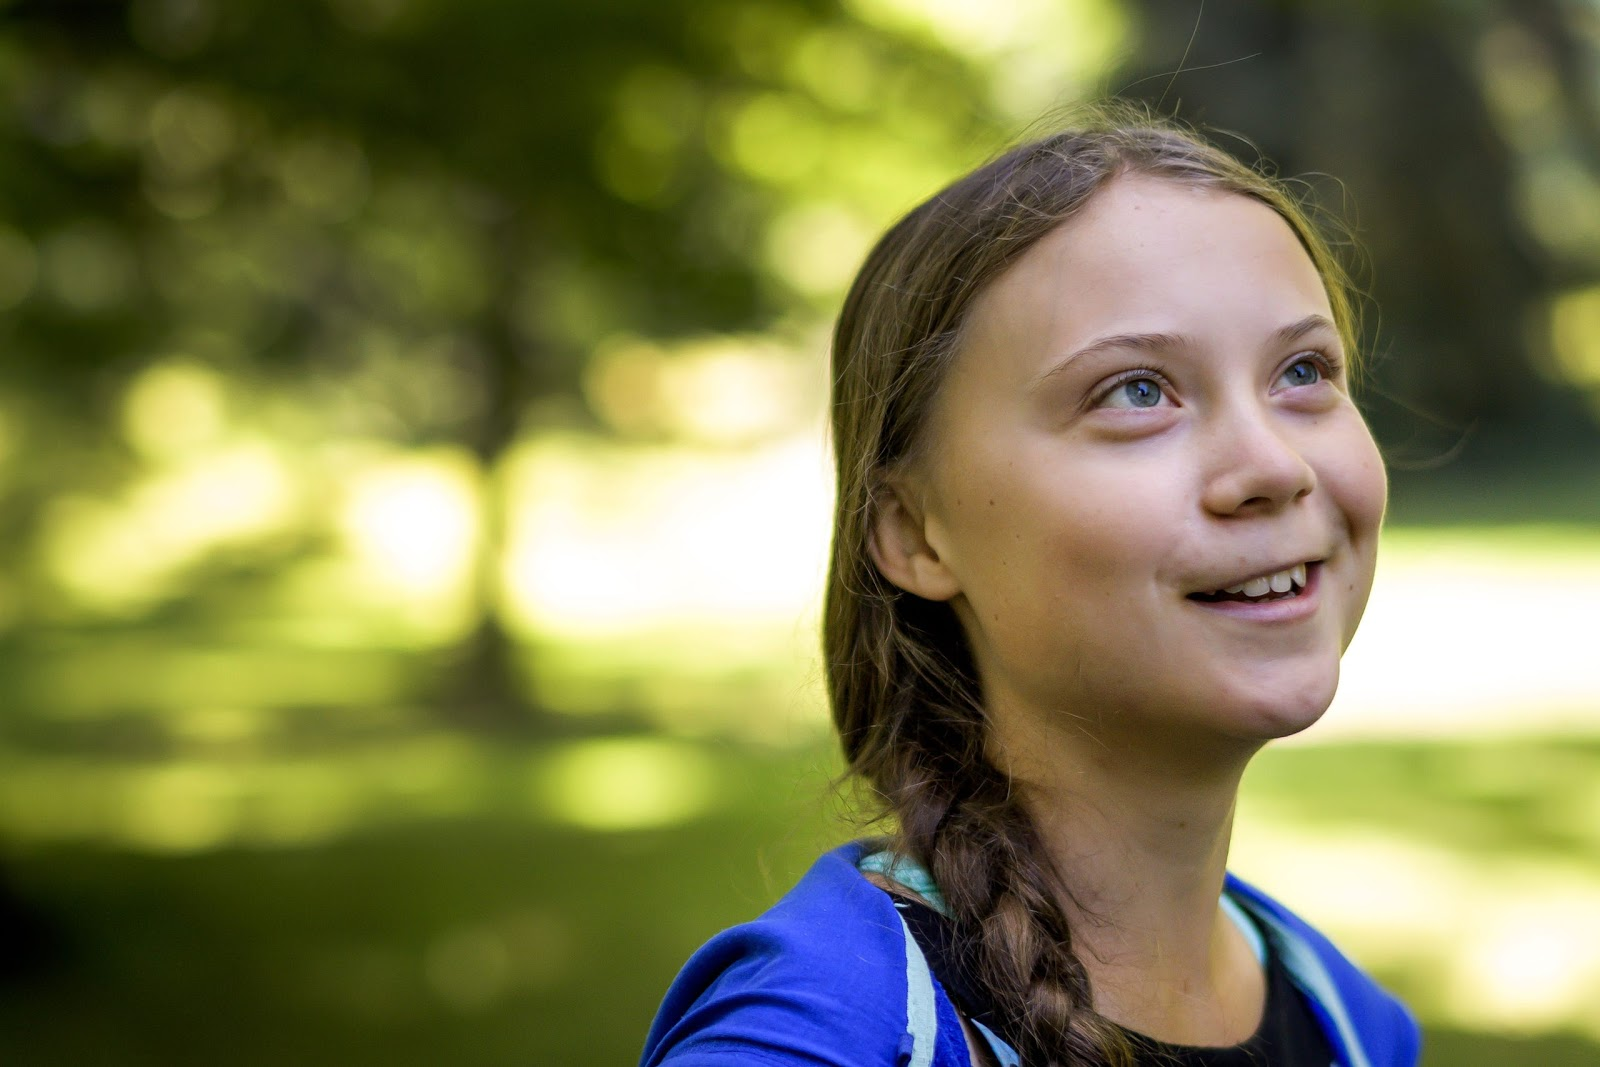 Image of Greta Thunberg.